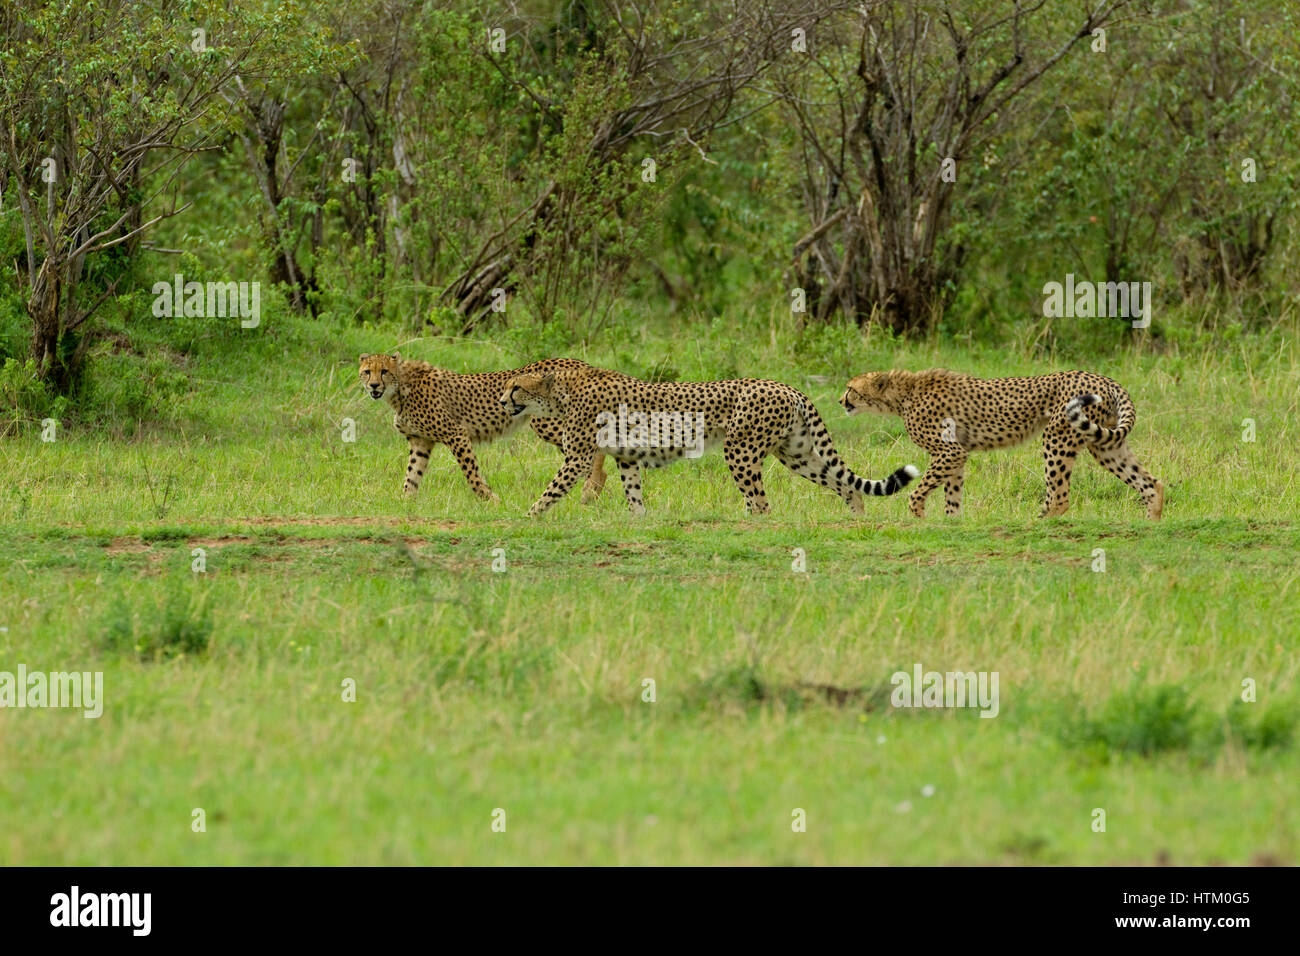 Three Cheetah (Acinonyx jubatus) males on the hunt, Masai Mara National Reserve, Kenya, East Africa - Stock Image